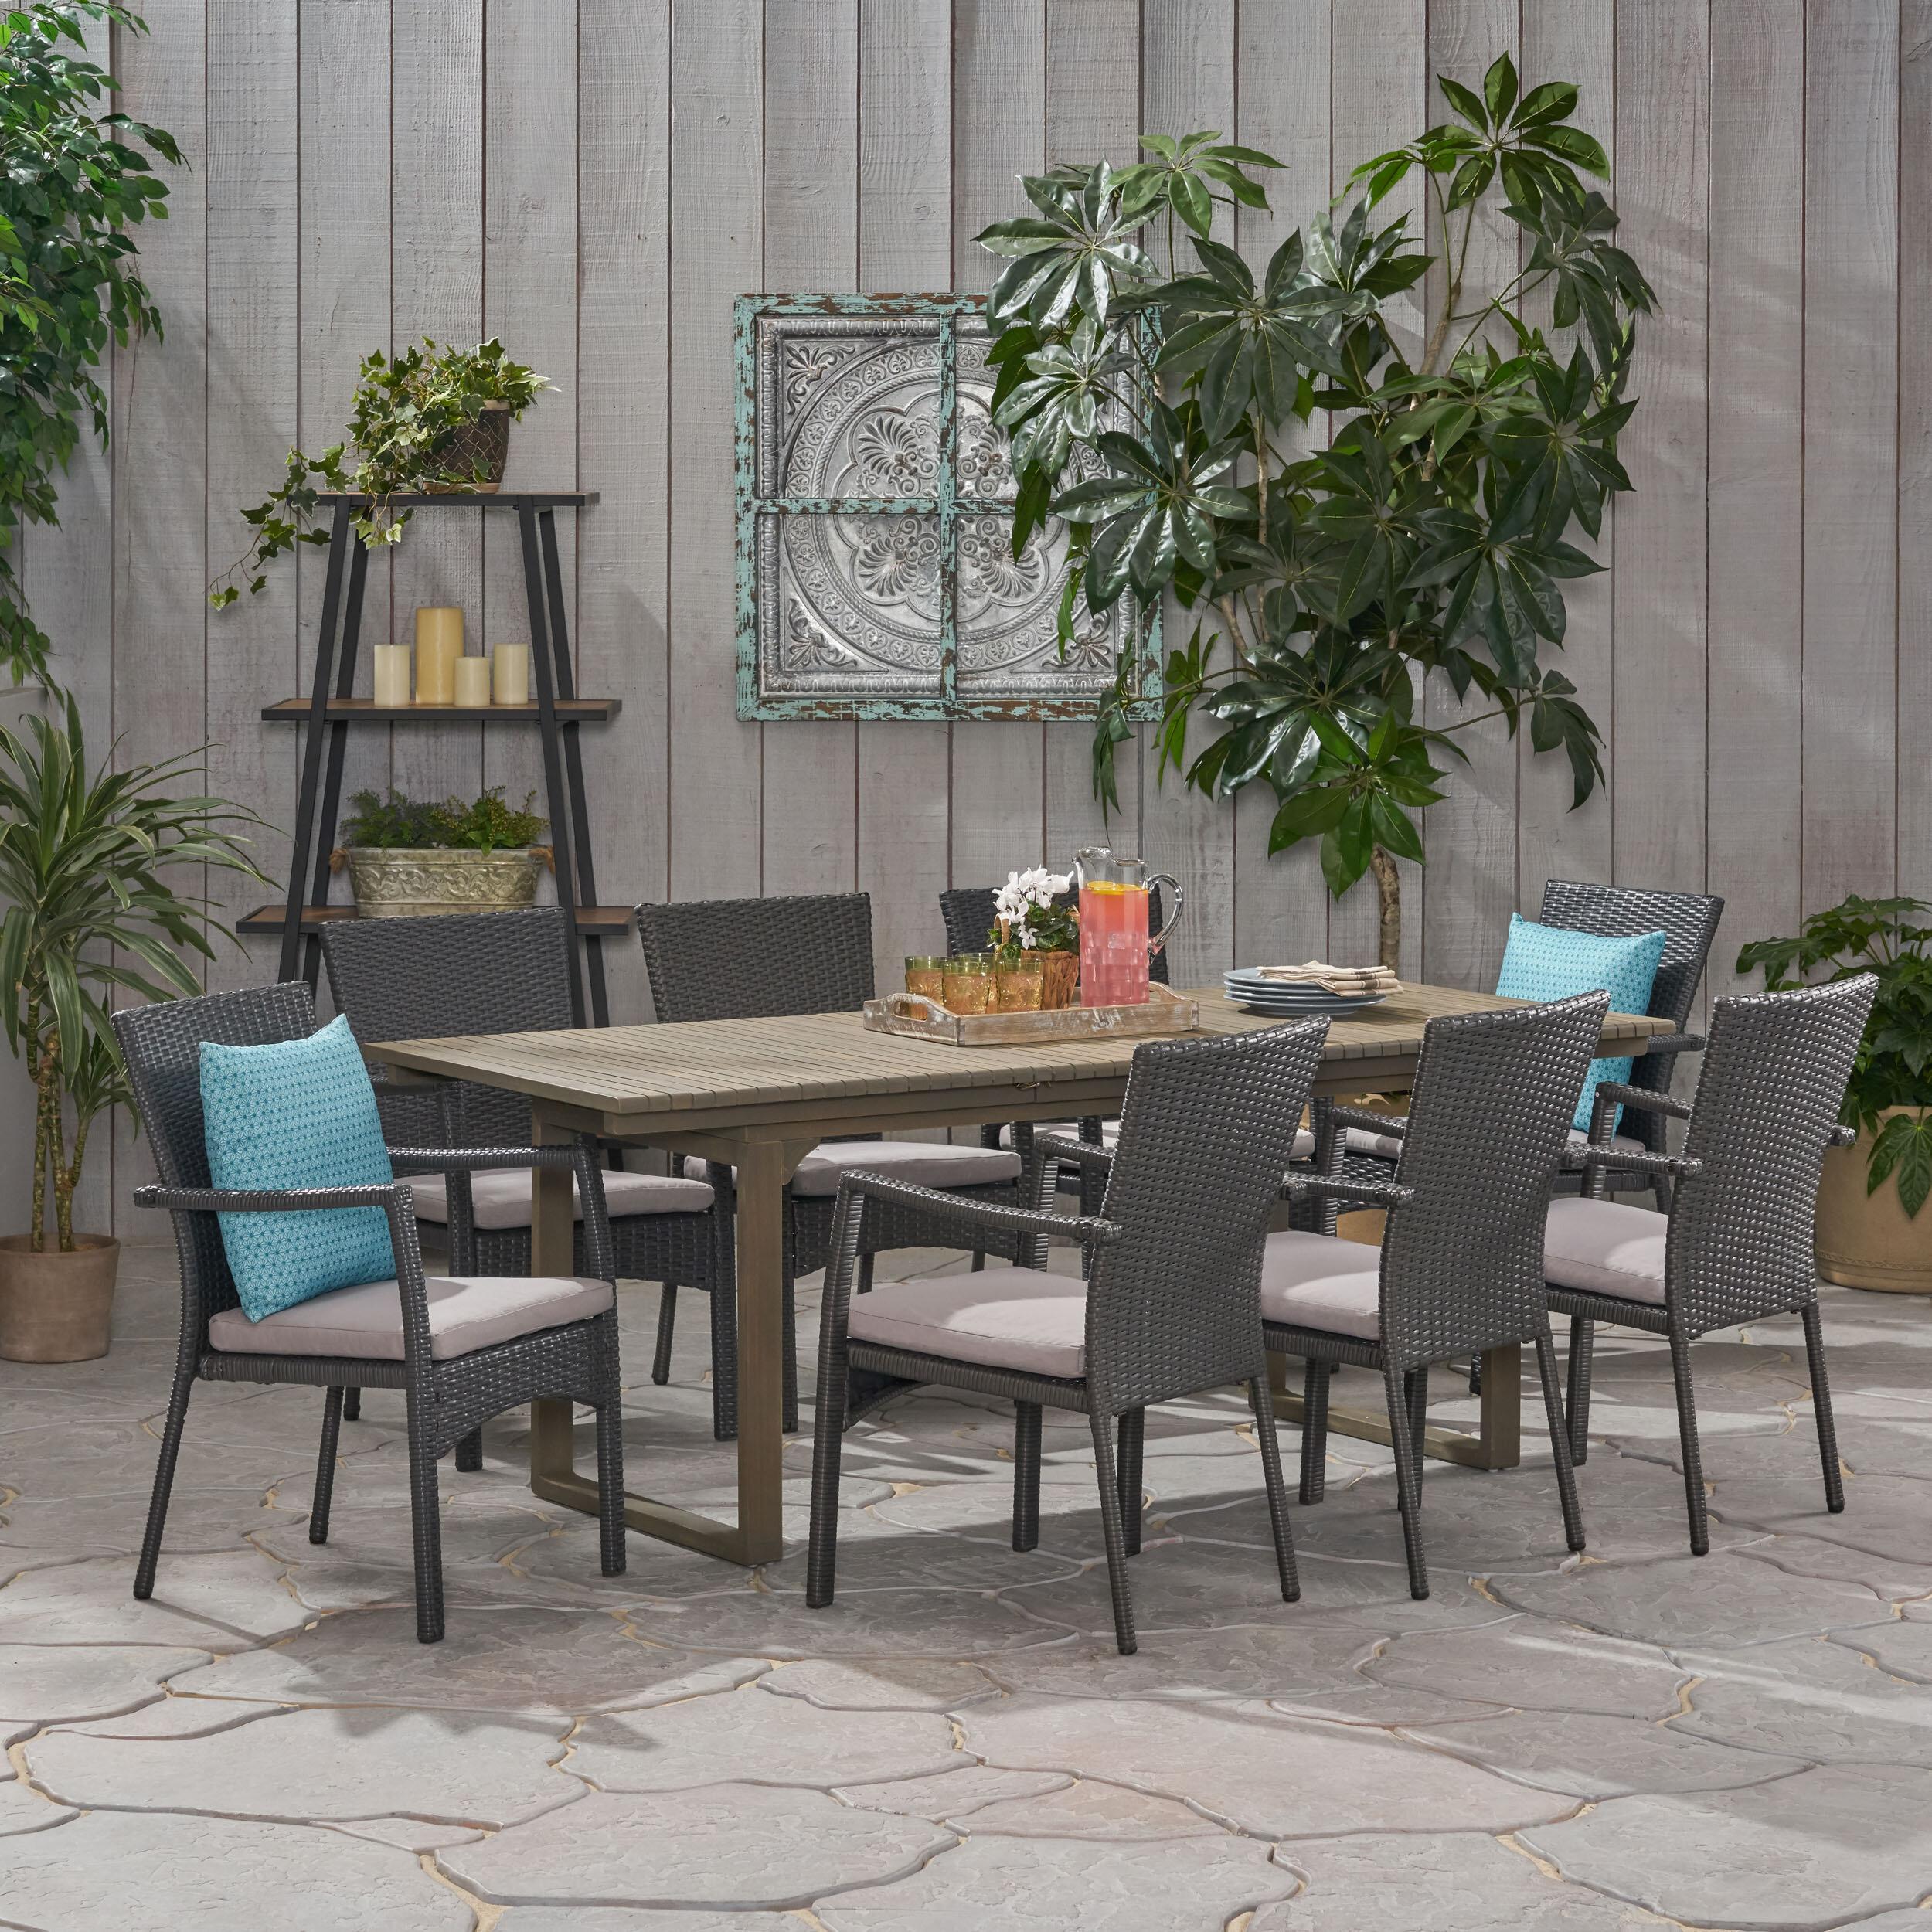 Ivy Bronx Chul Outdoor 9 Piece Dining Set With Cushions Wayfair